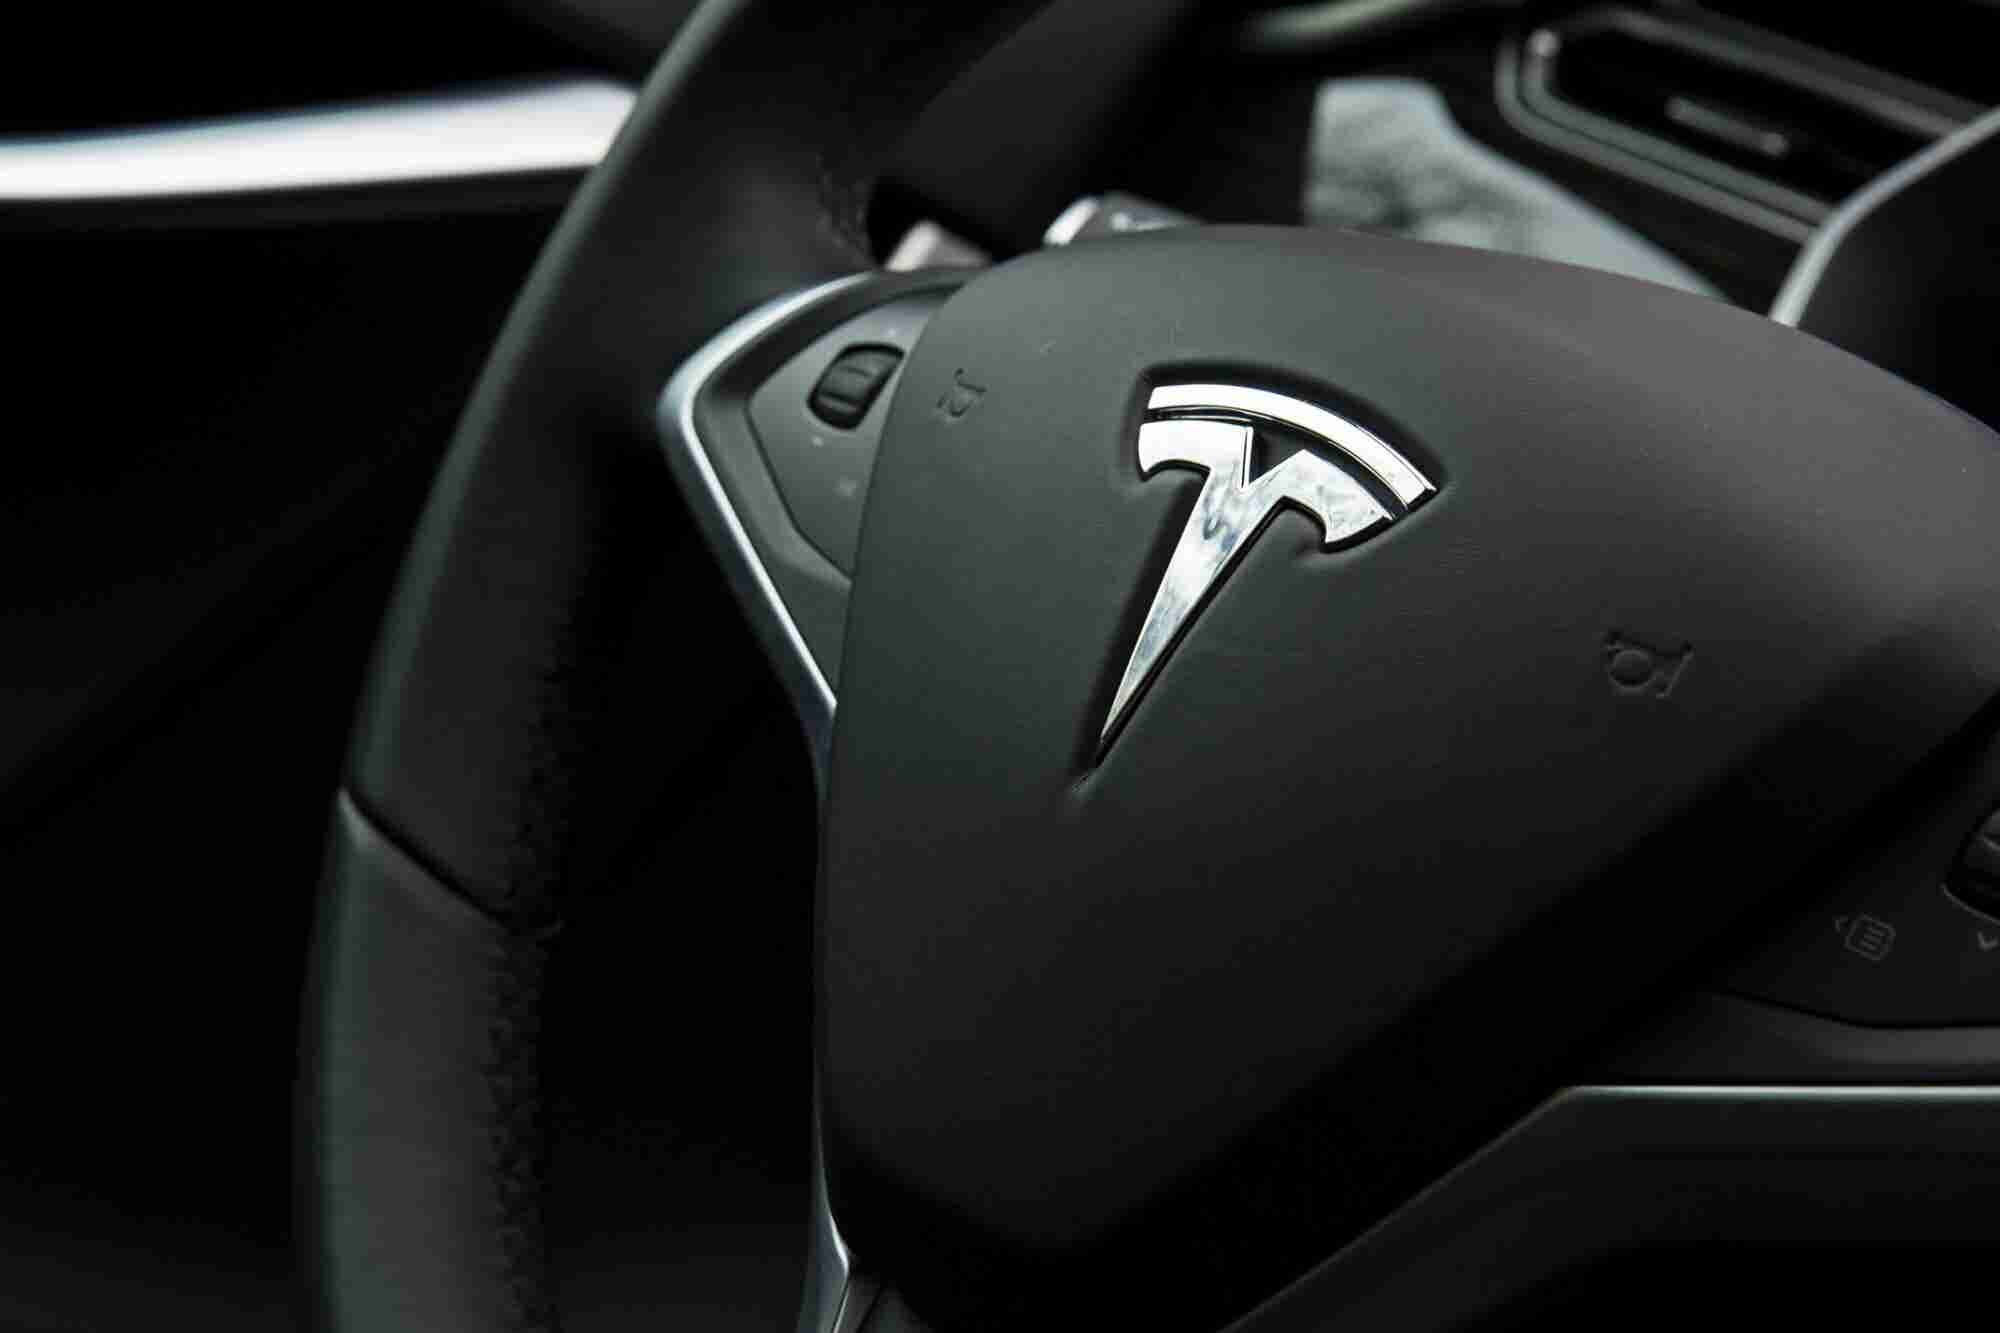 Technology Stocks Lead Market Higher Despite Another Tesla Crash